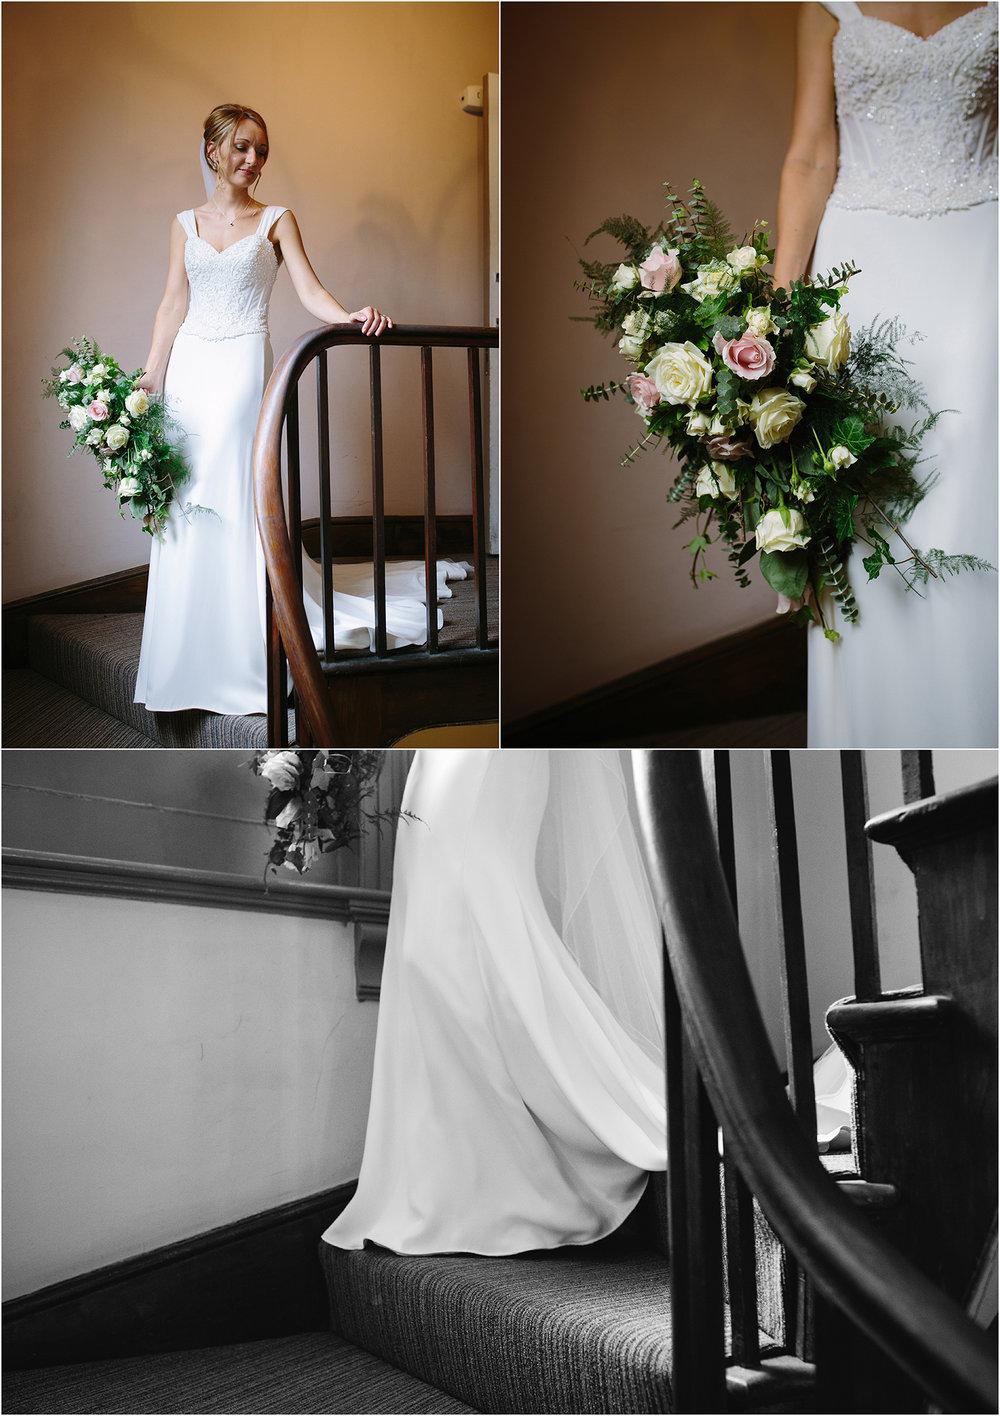 creative-wedding-photographer-worcester-025.jpg